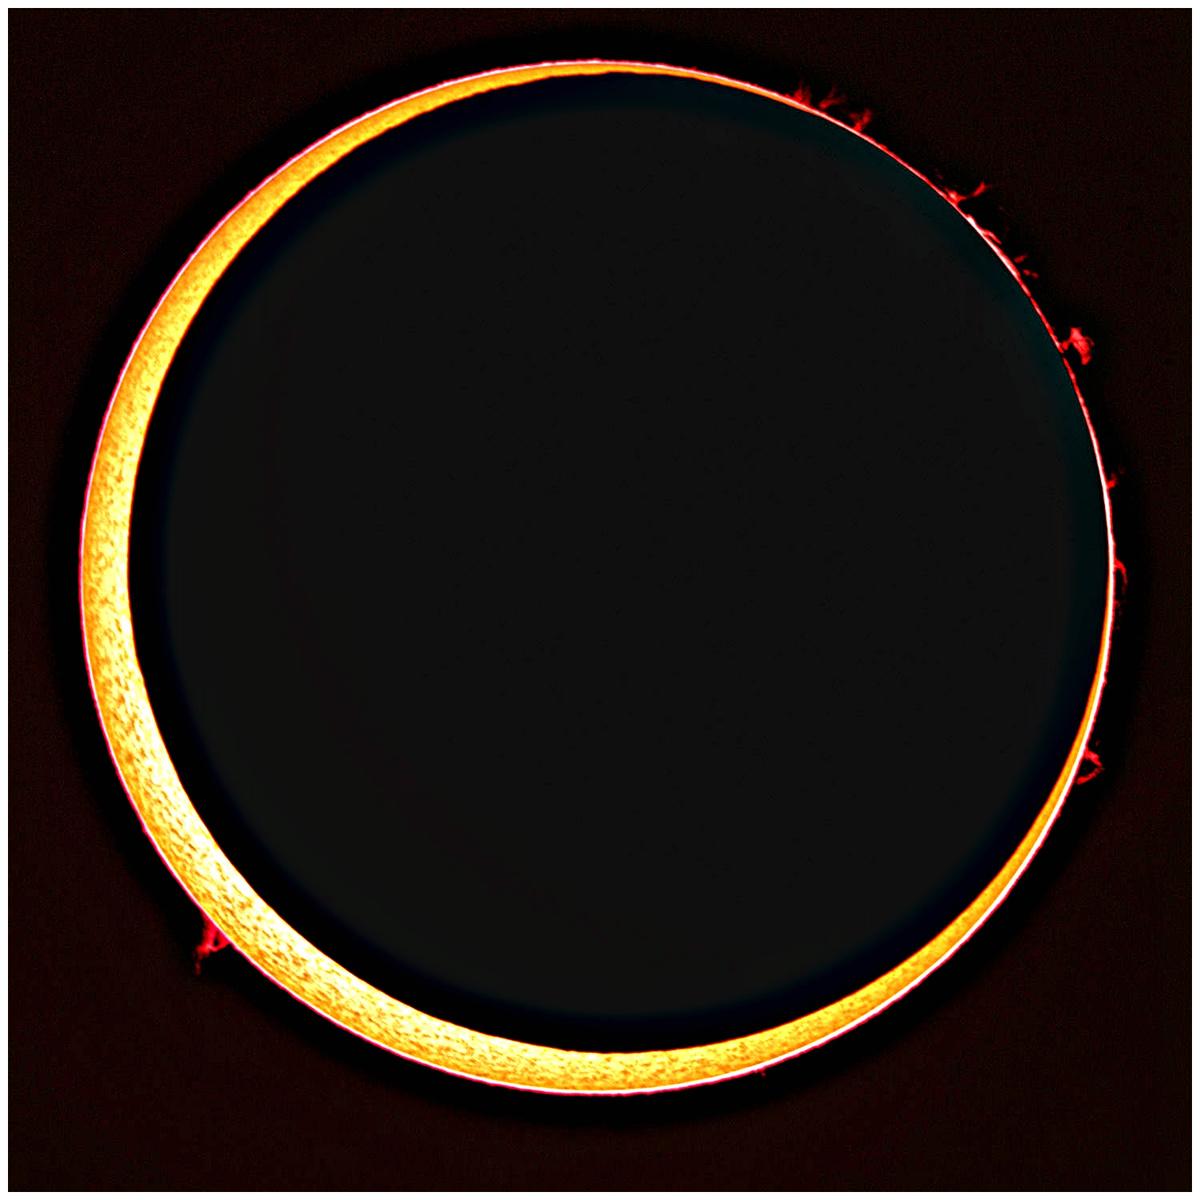 Cuuta Chase & M.Kozi - The Eclipse L.P.